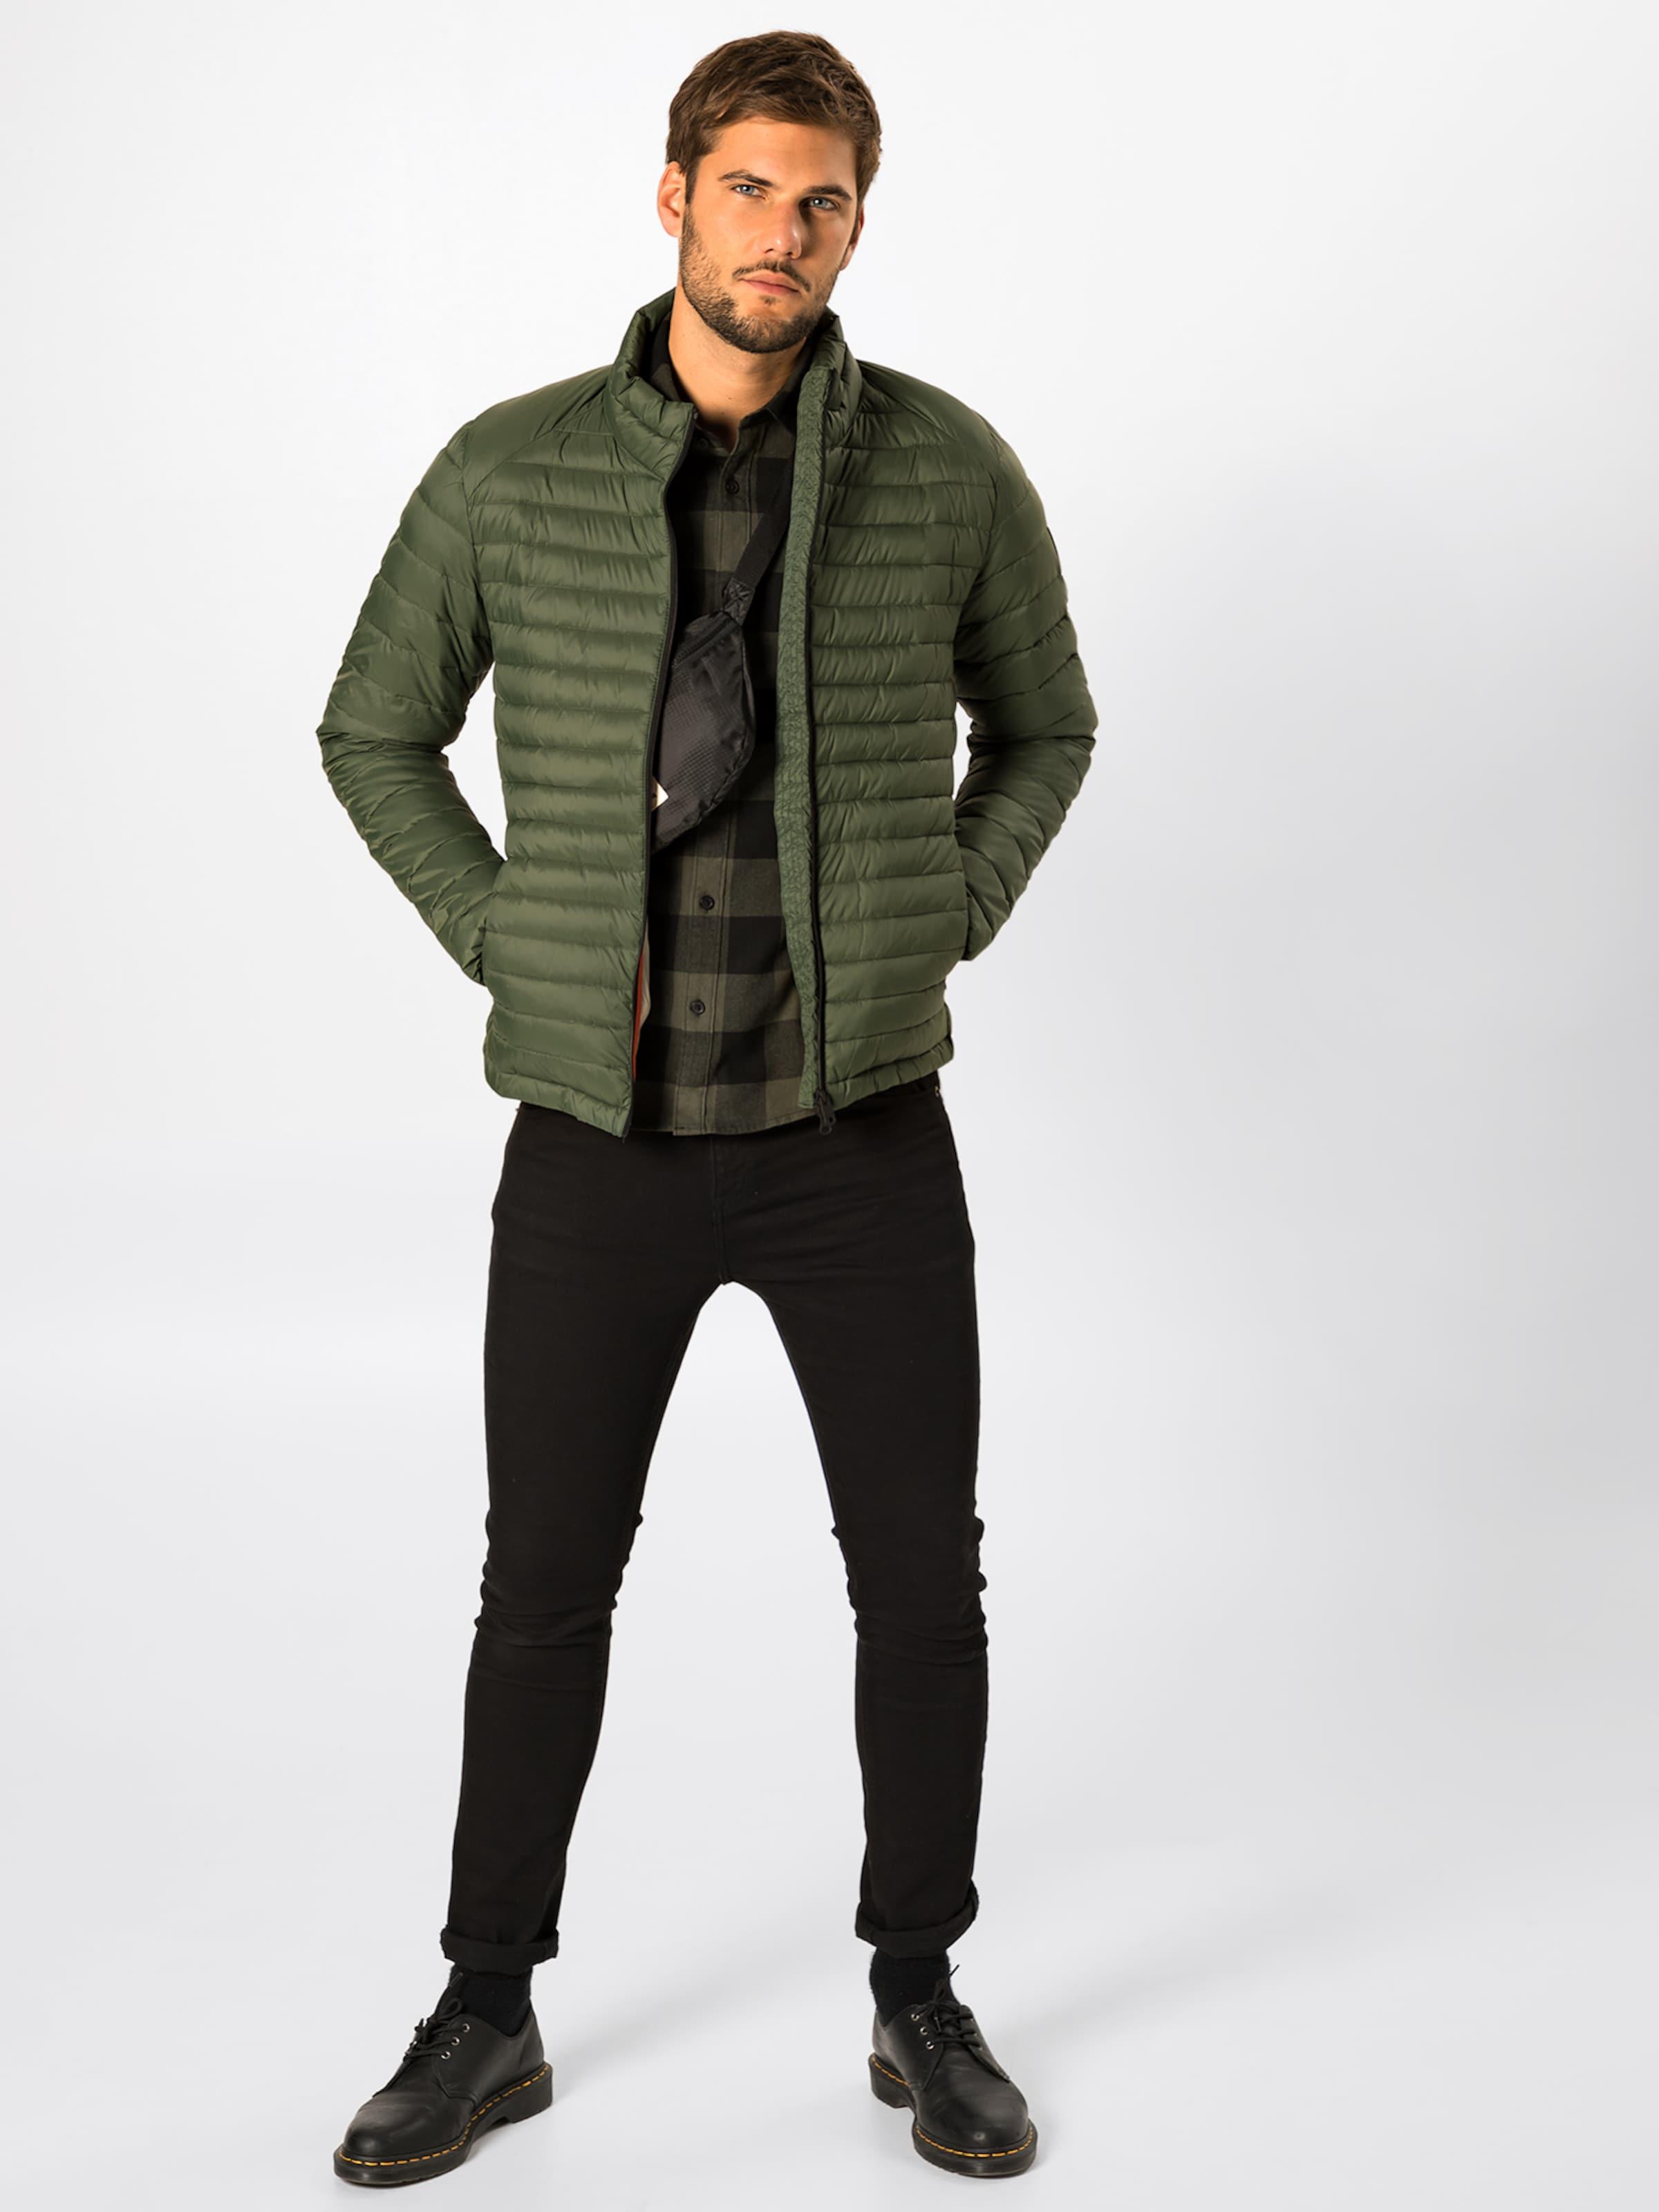 Mi En Olive Ecoalf Veste saison 'beret' QhtsrdC